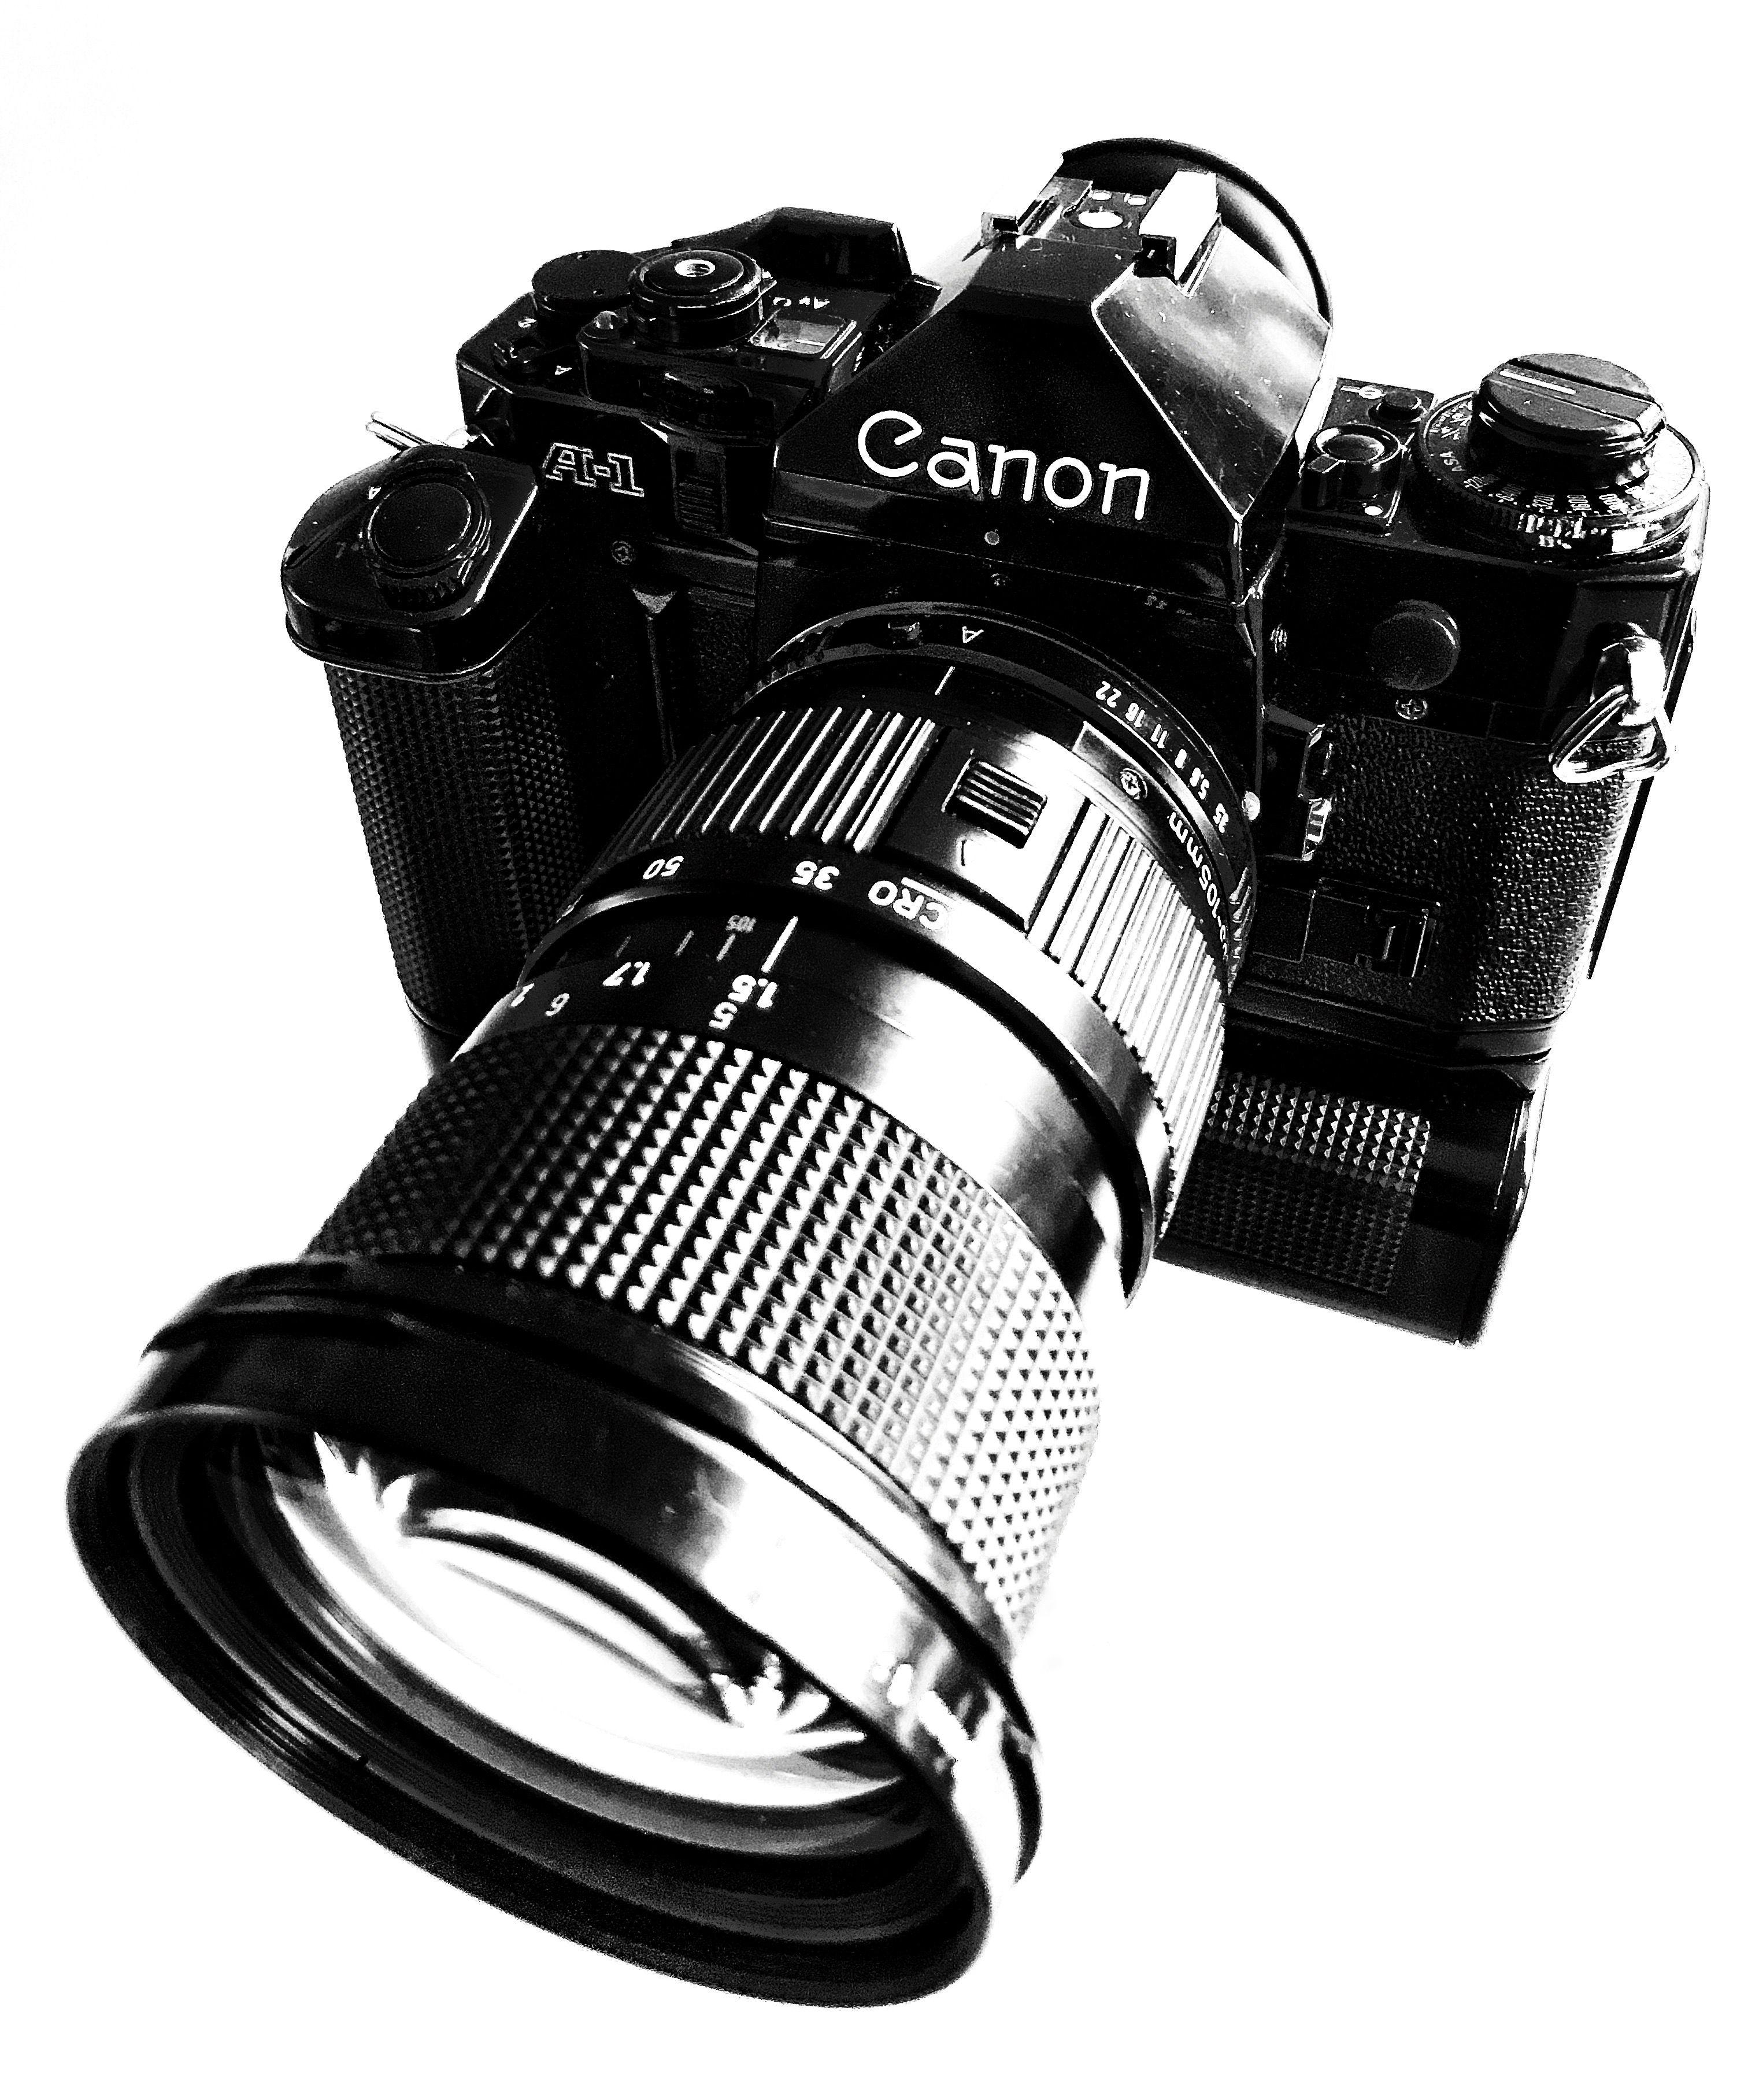 Pin By Marius Jore On Interesting Pins Retro Camera Photography Binoculars